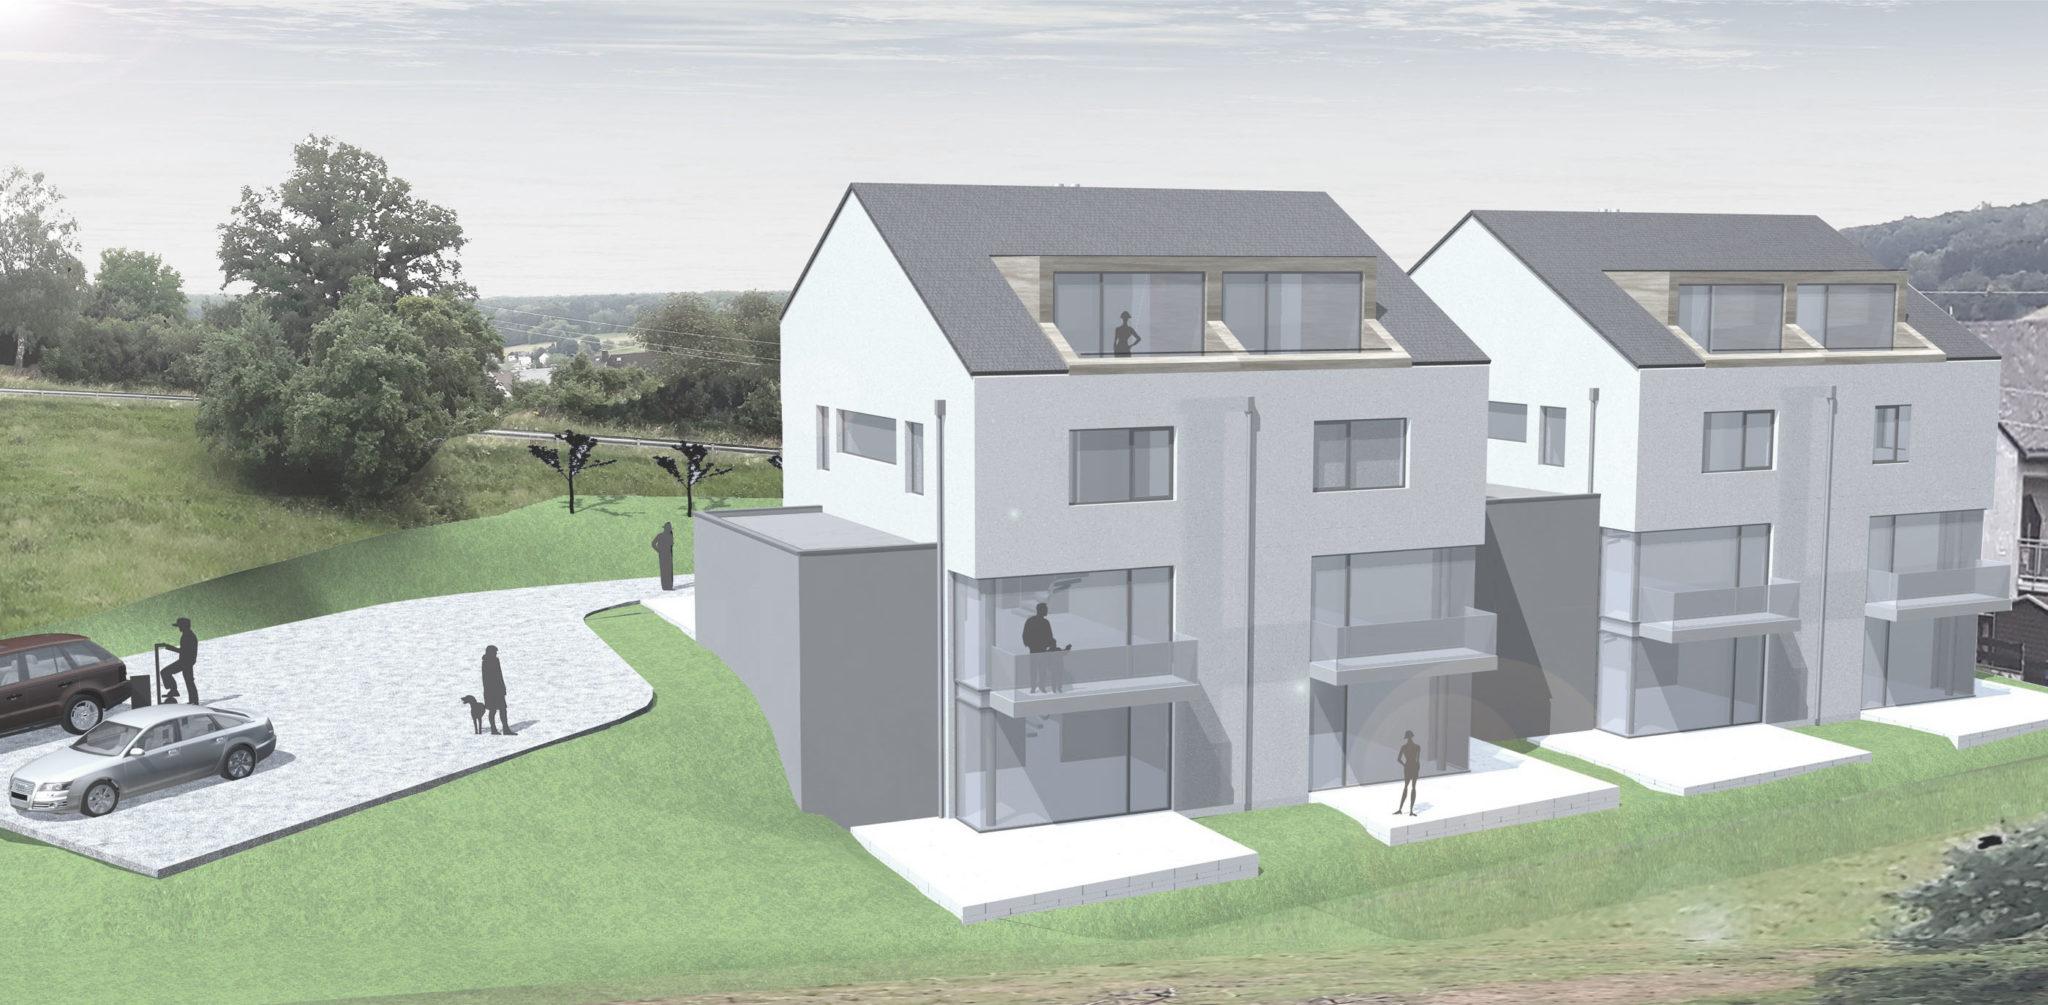 Projektentwicklung DHH Rendering Häuser